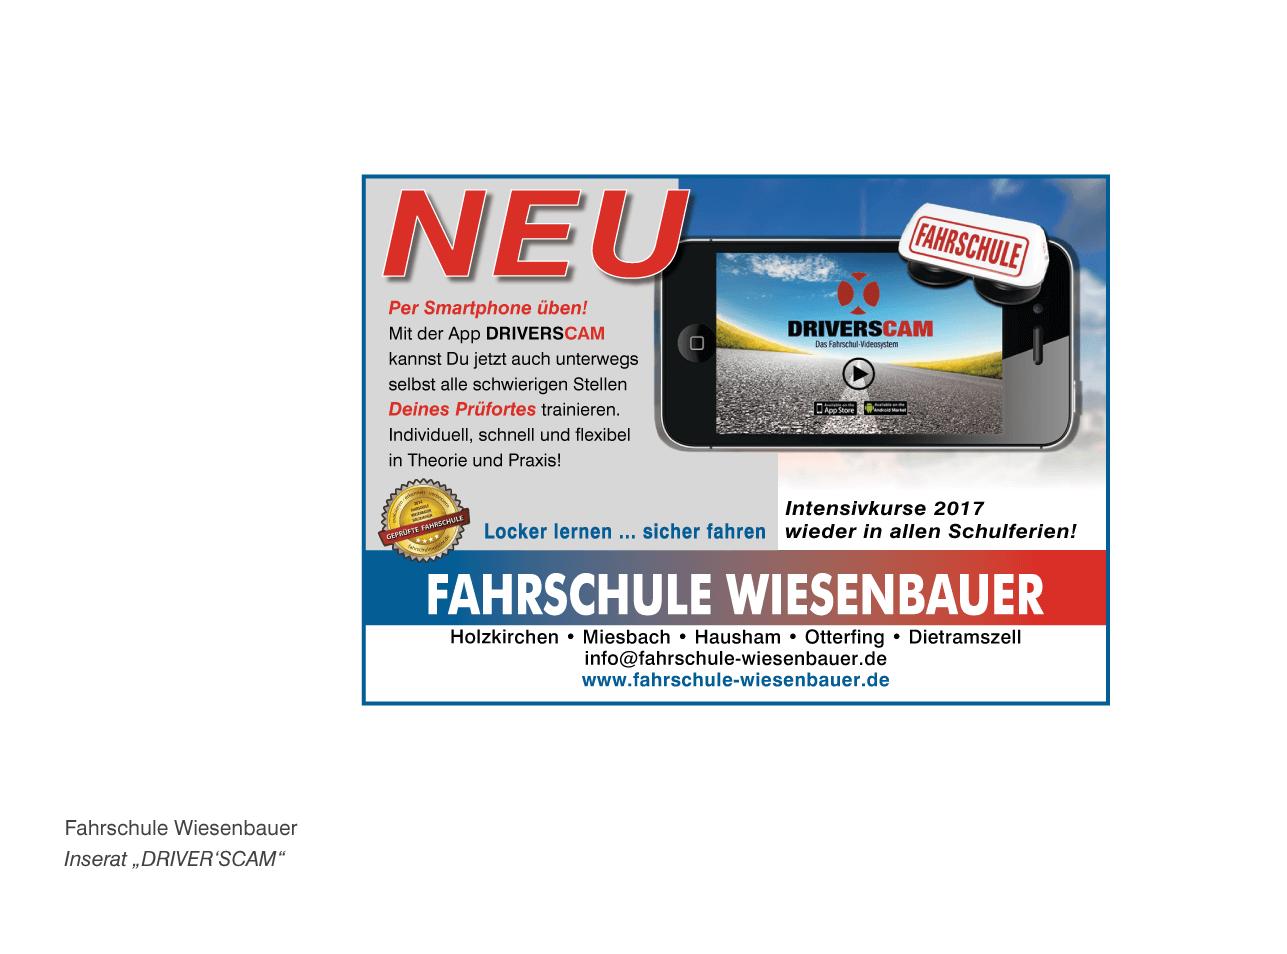 "Fahrschule Wiesenbauer - Inserat ""DRIVER'SCAM"""